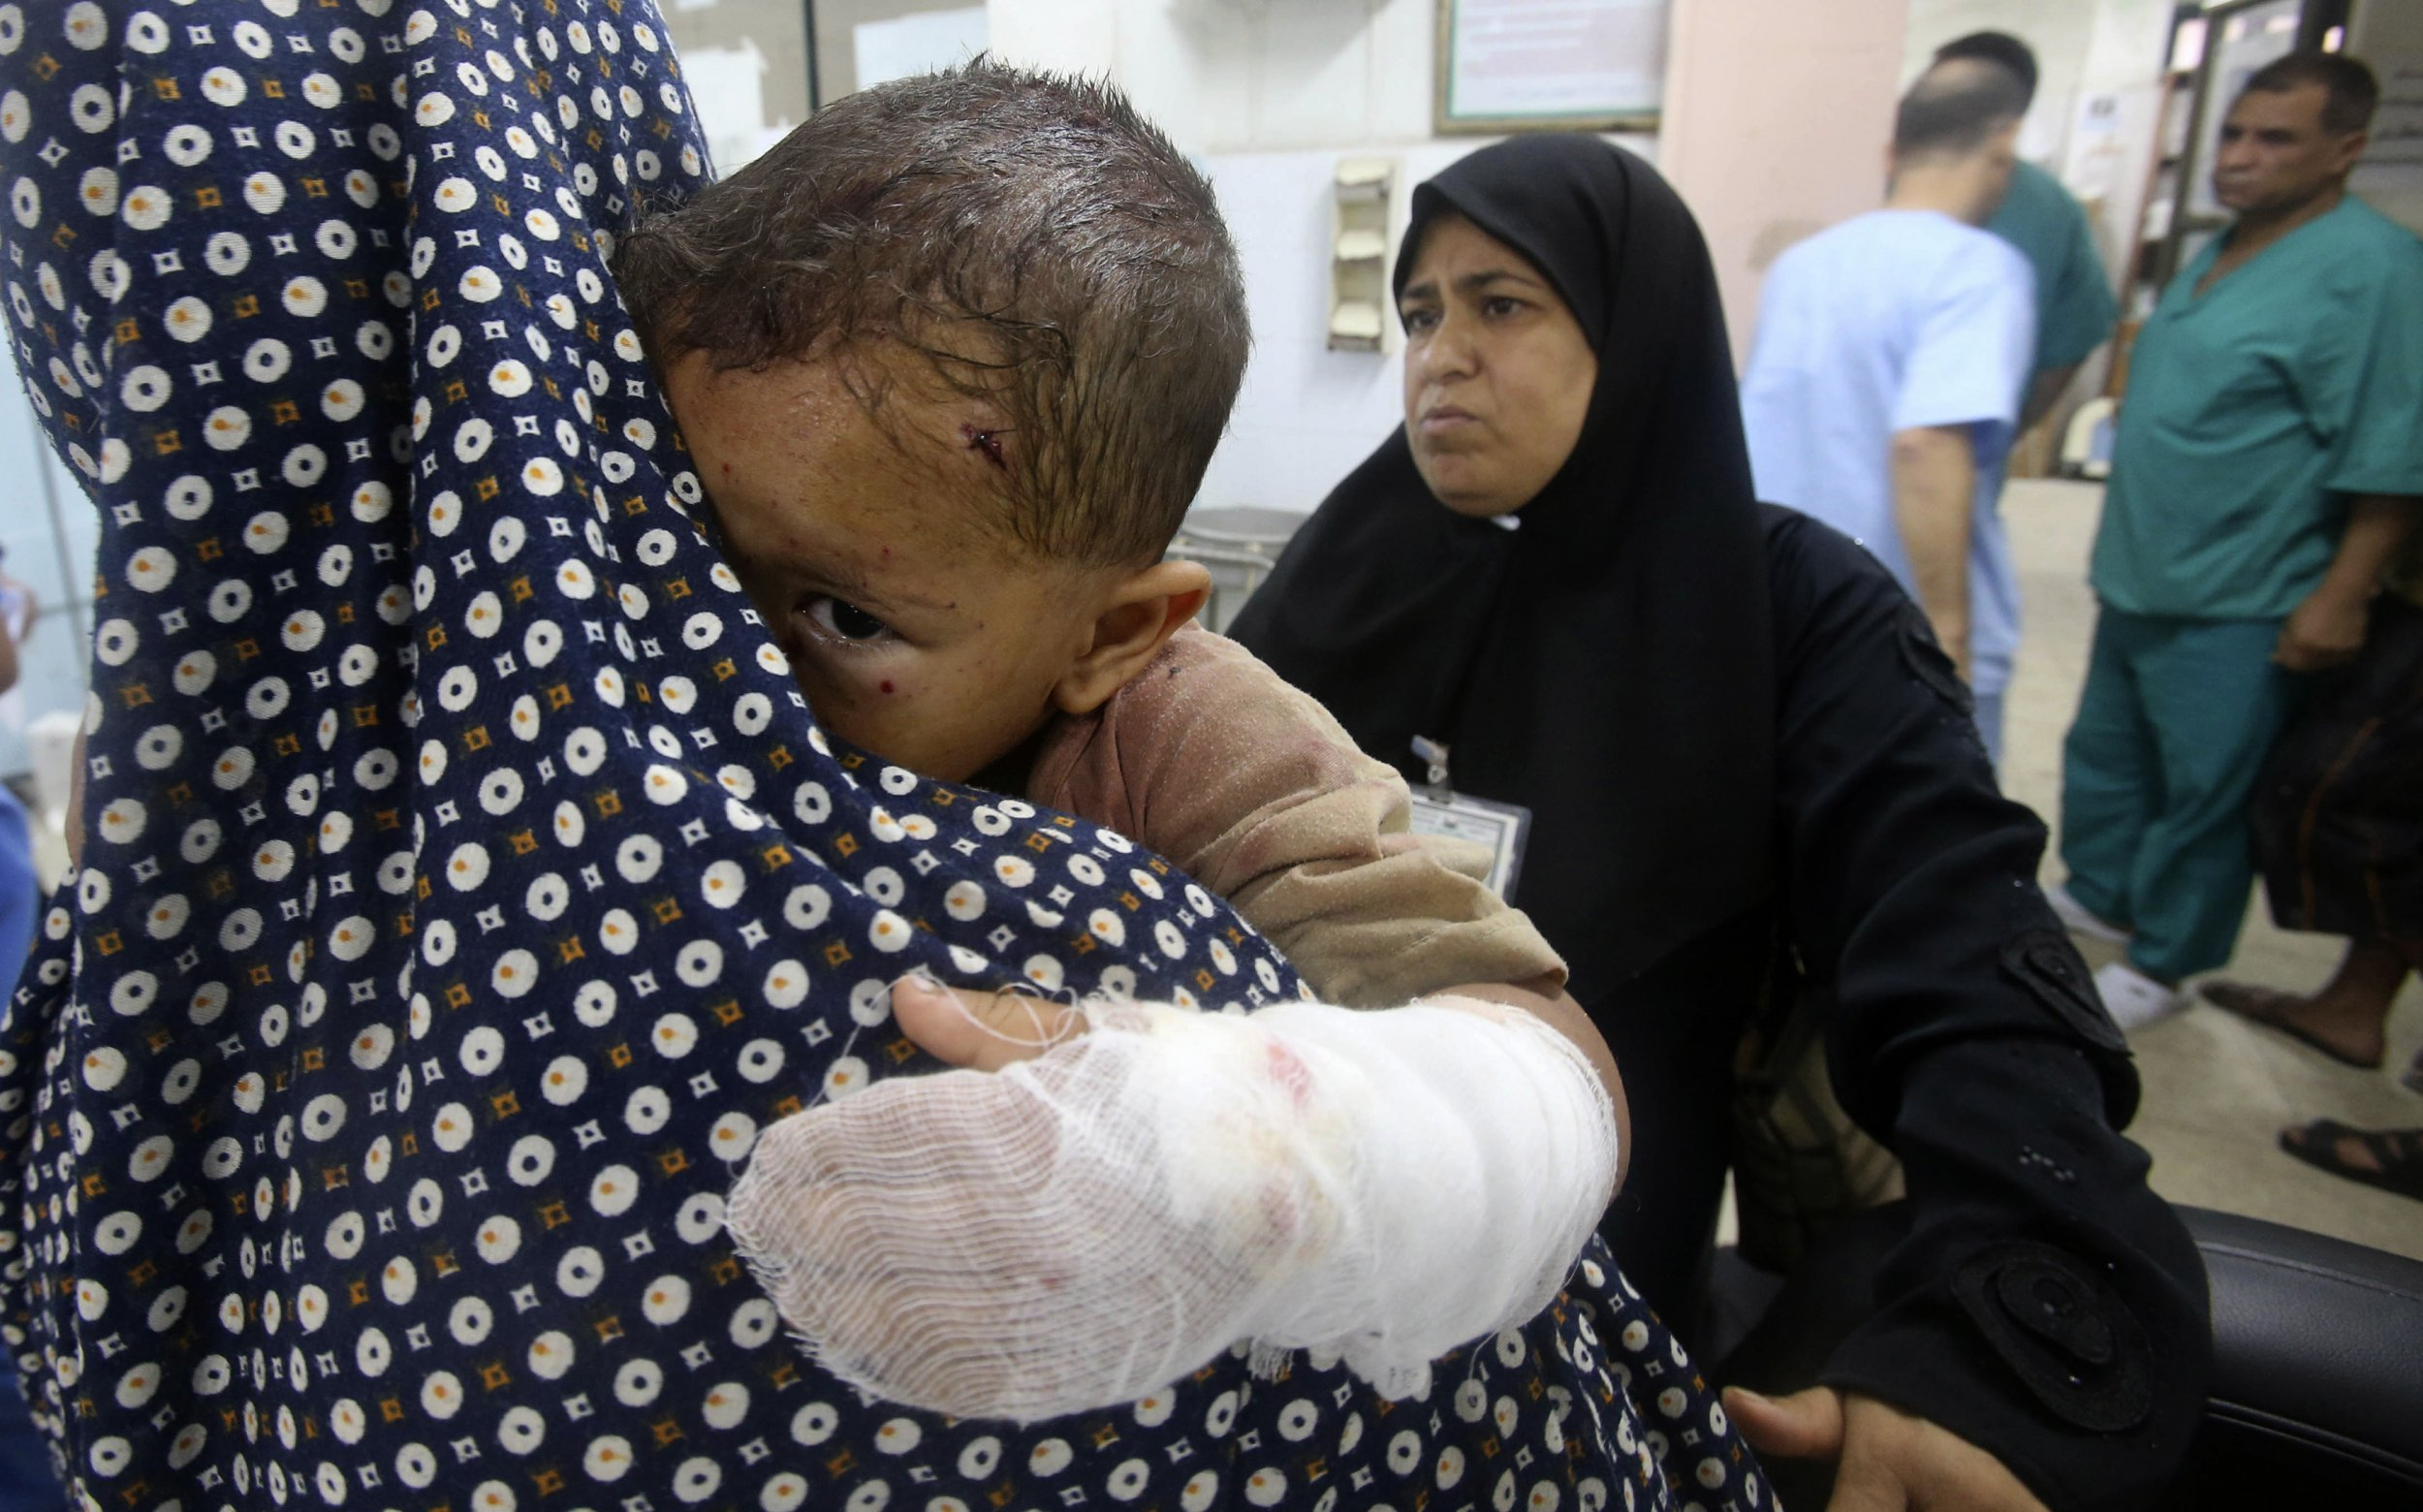 Gaza wounded boy